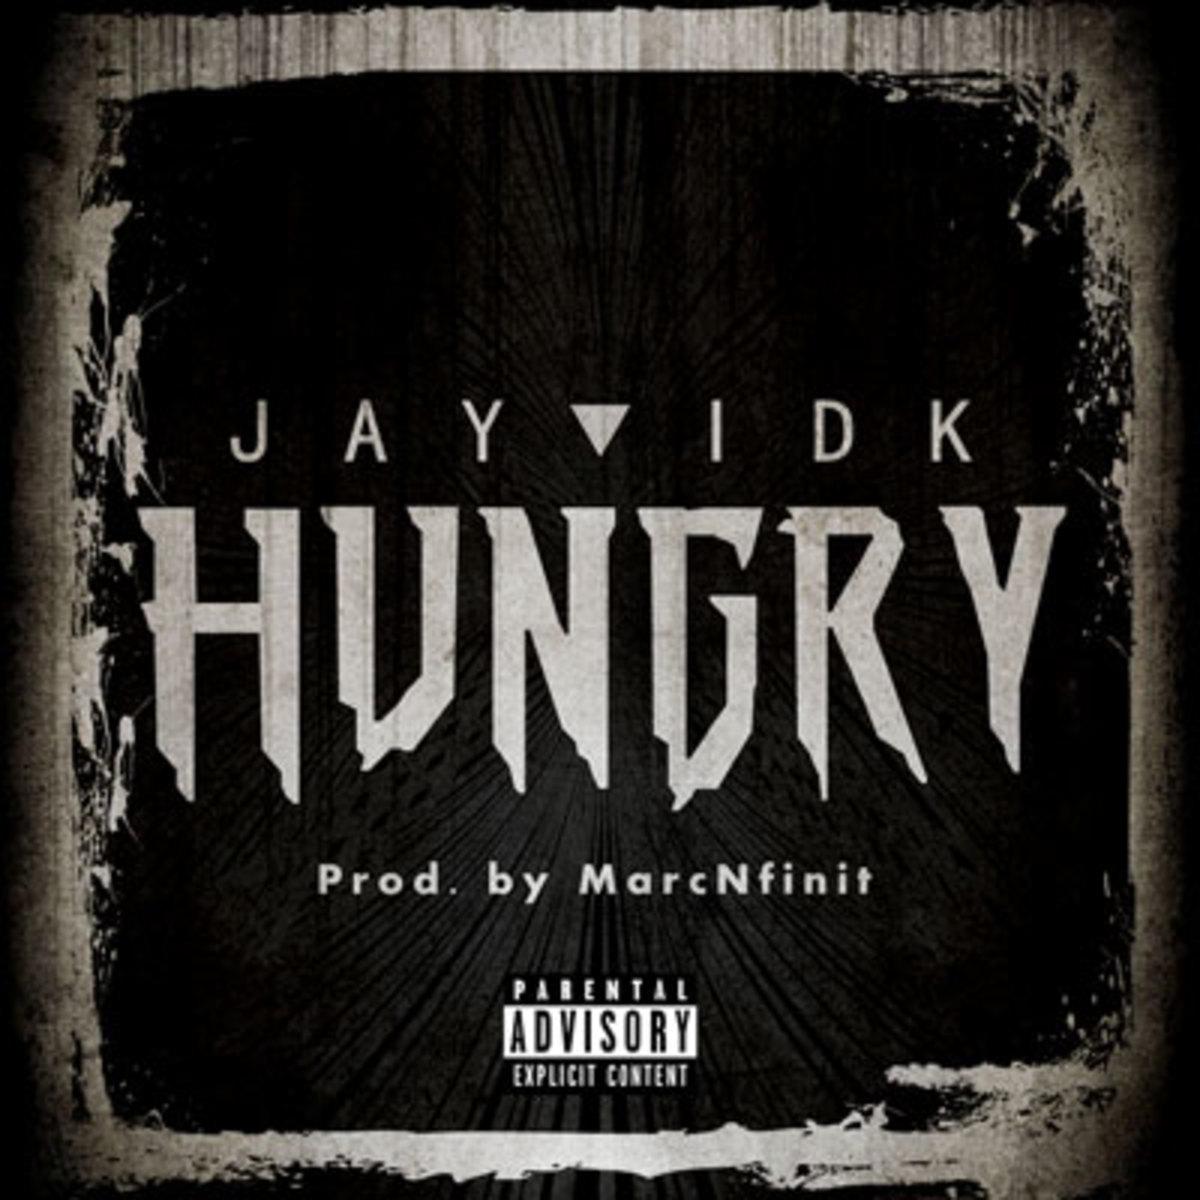 jayidk-hungry.jpg